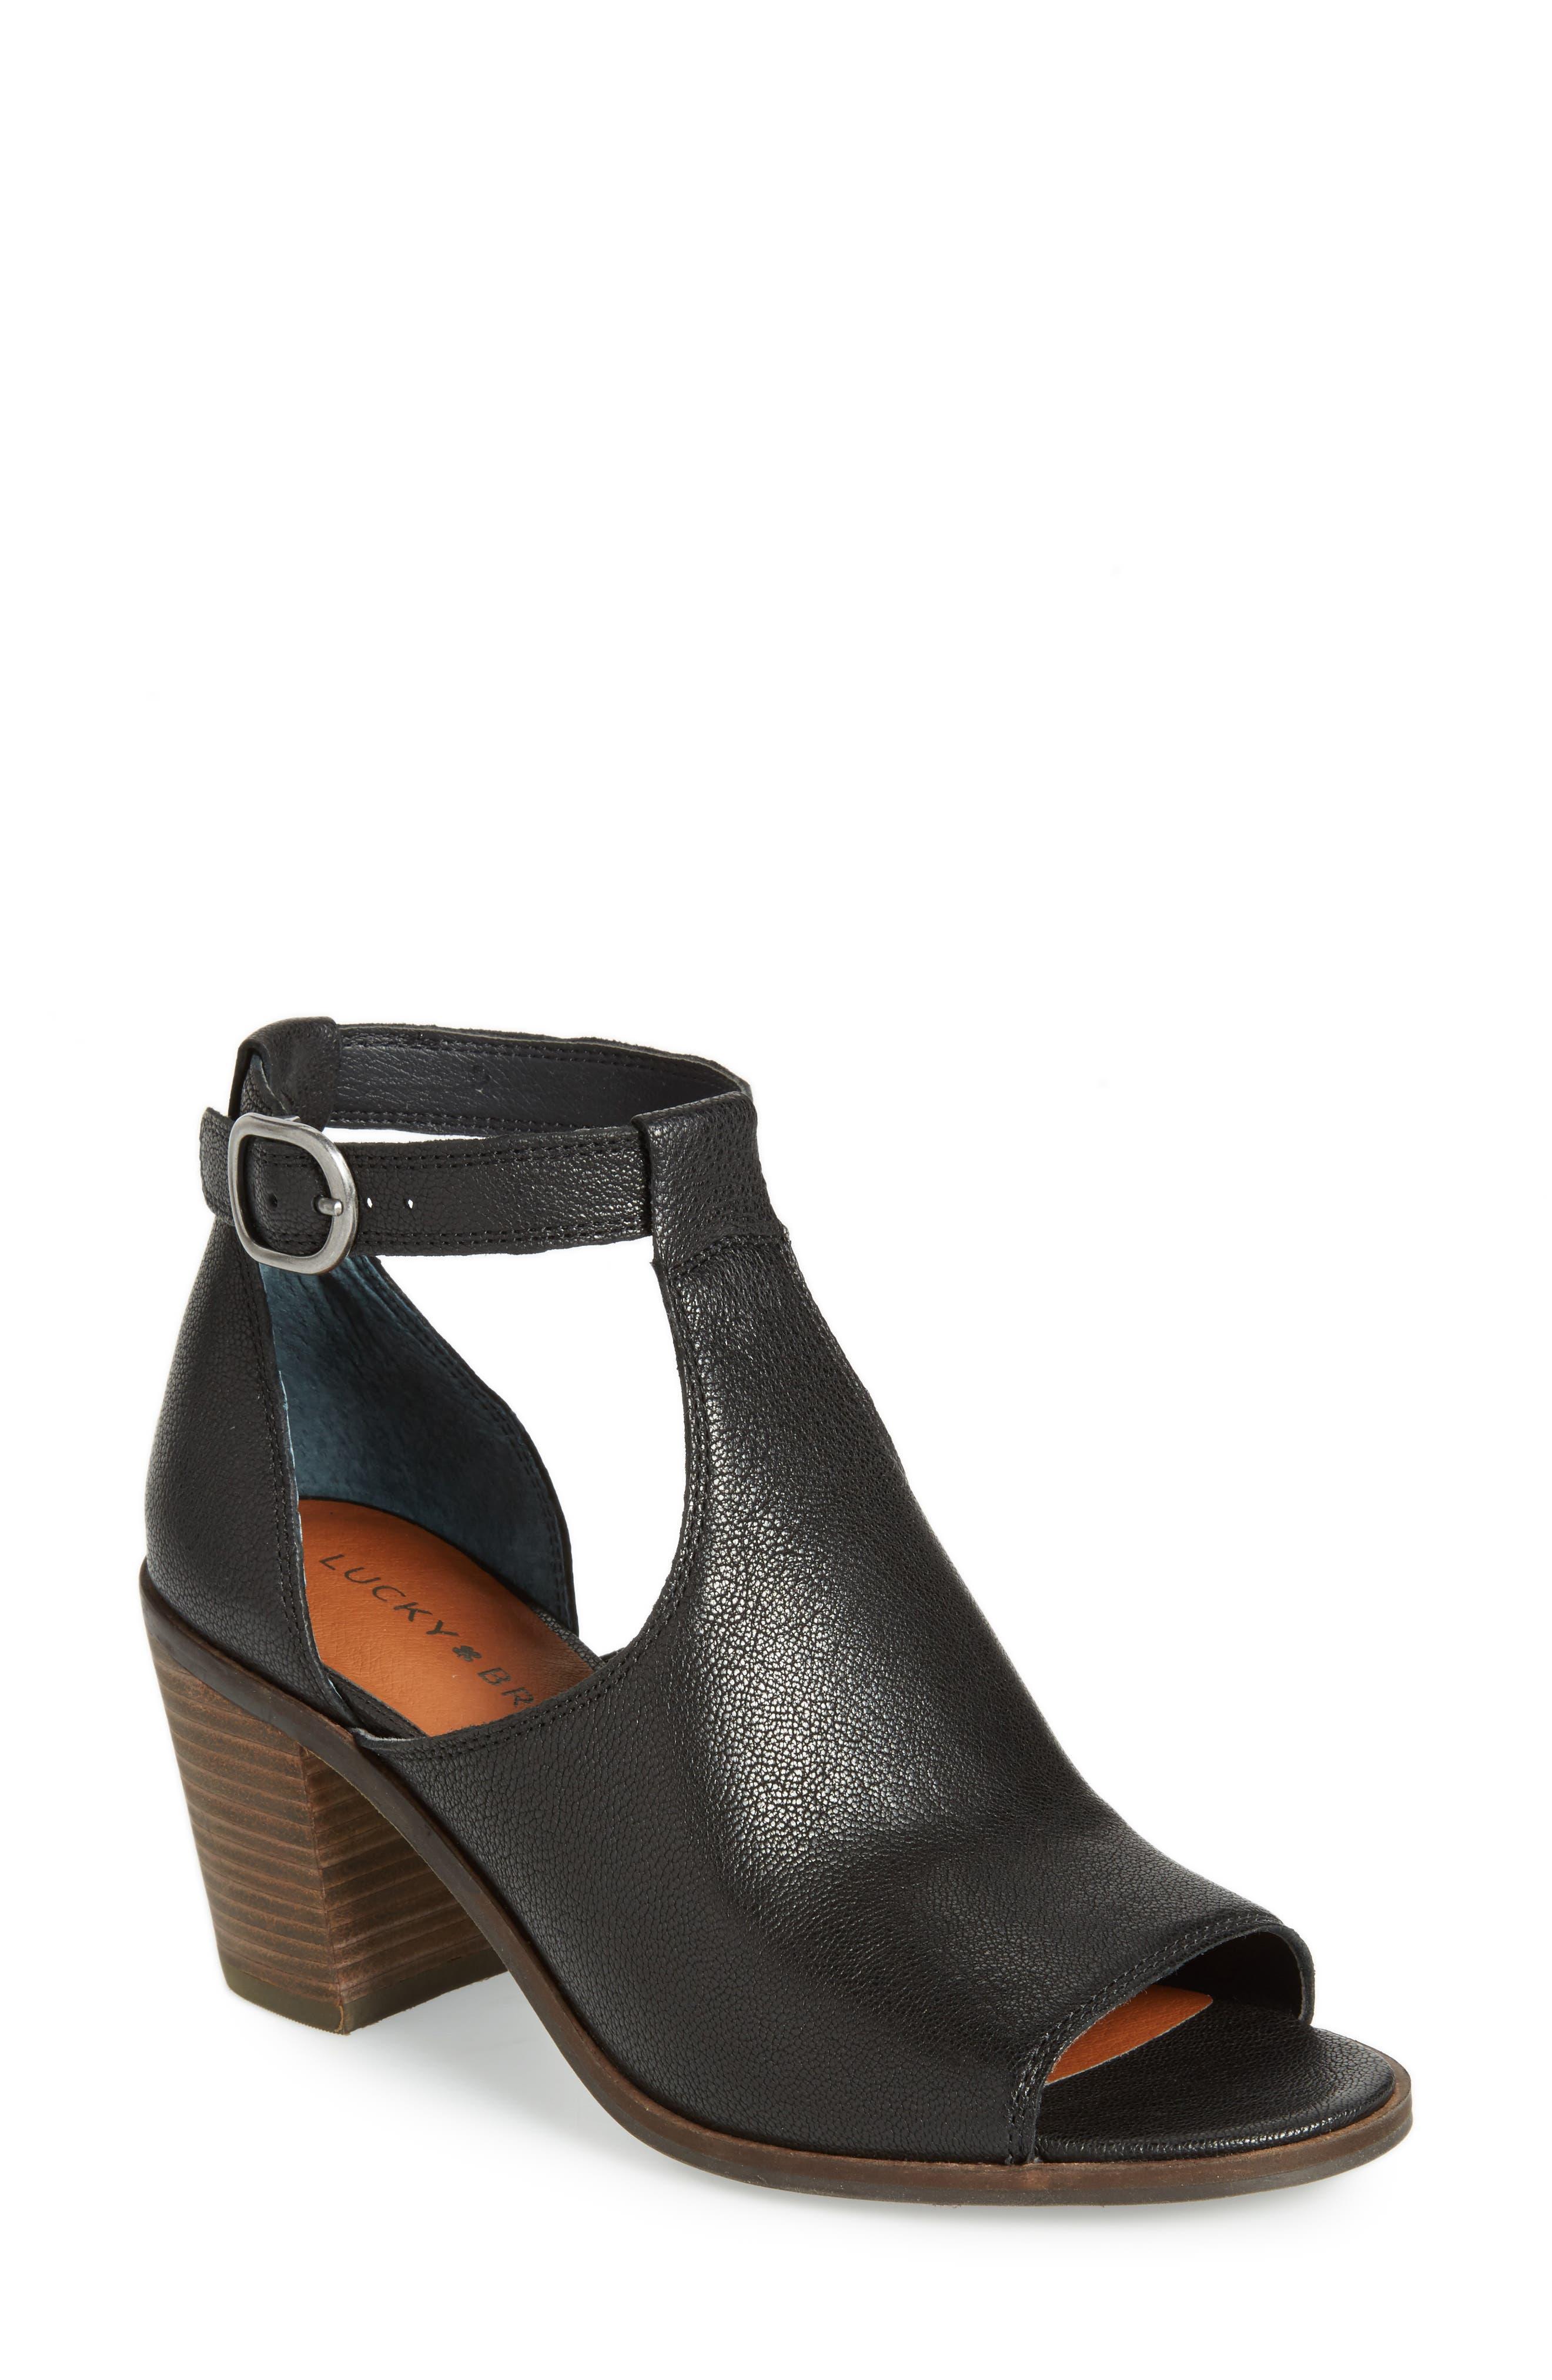 Kadian Block Heel Sandal,                             Main thumbnail 1, color,